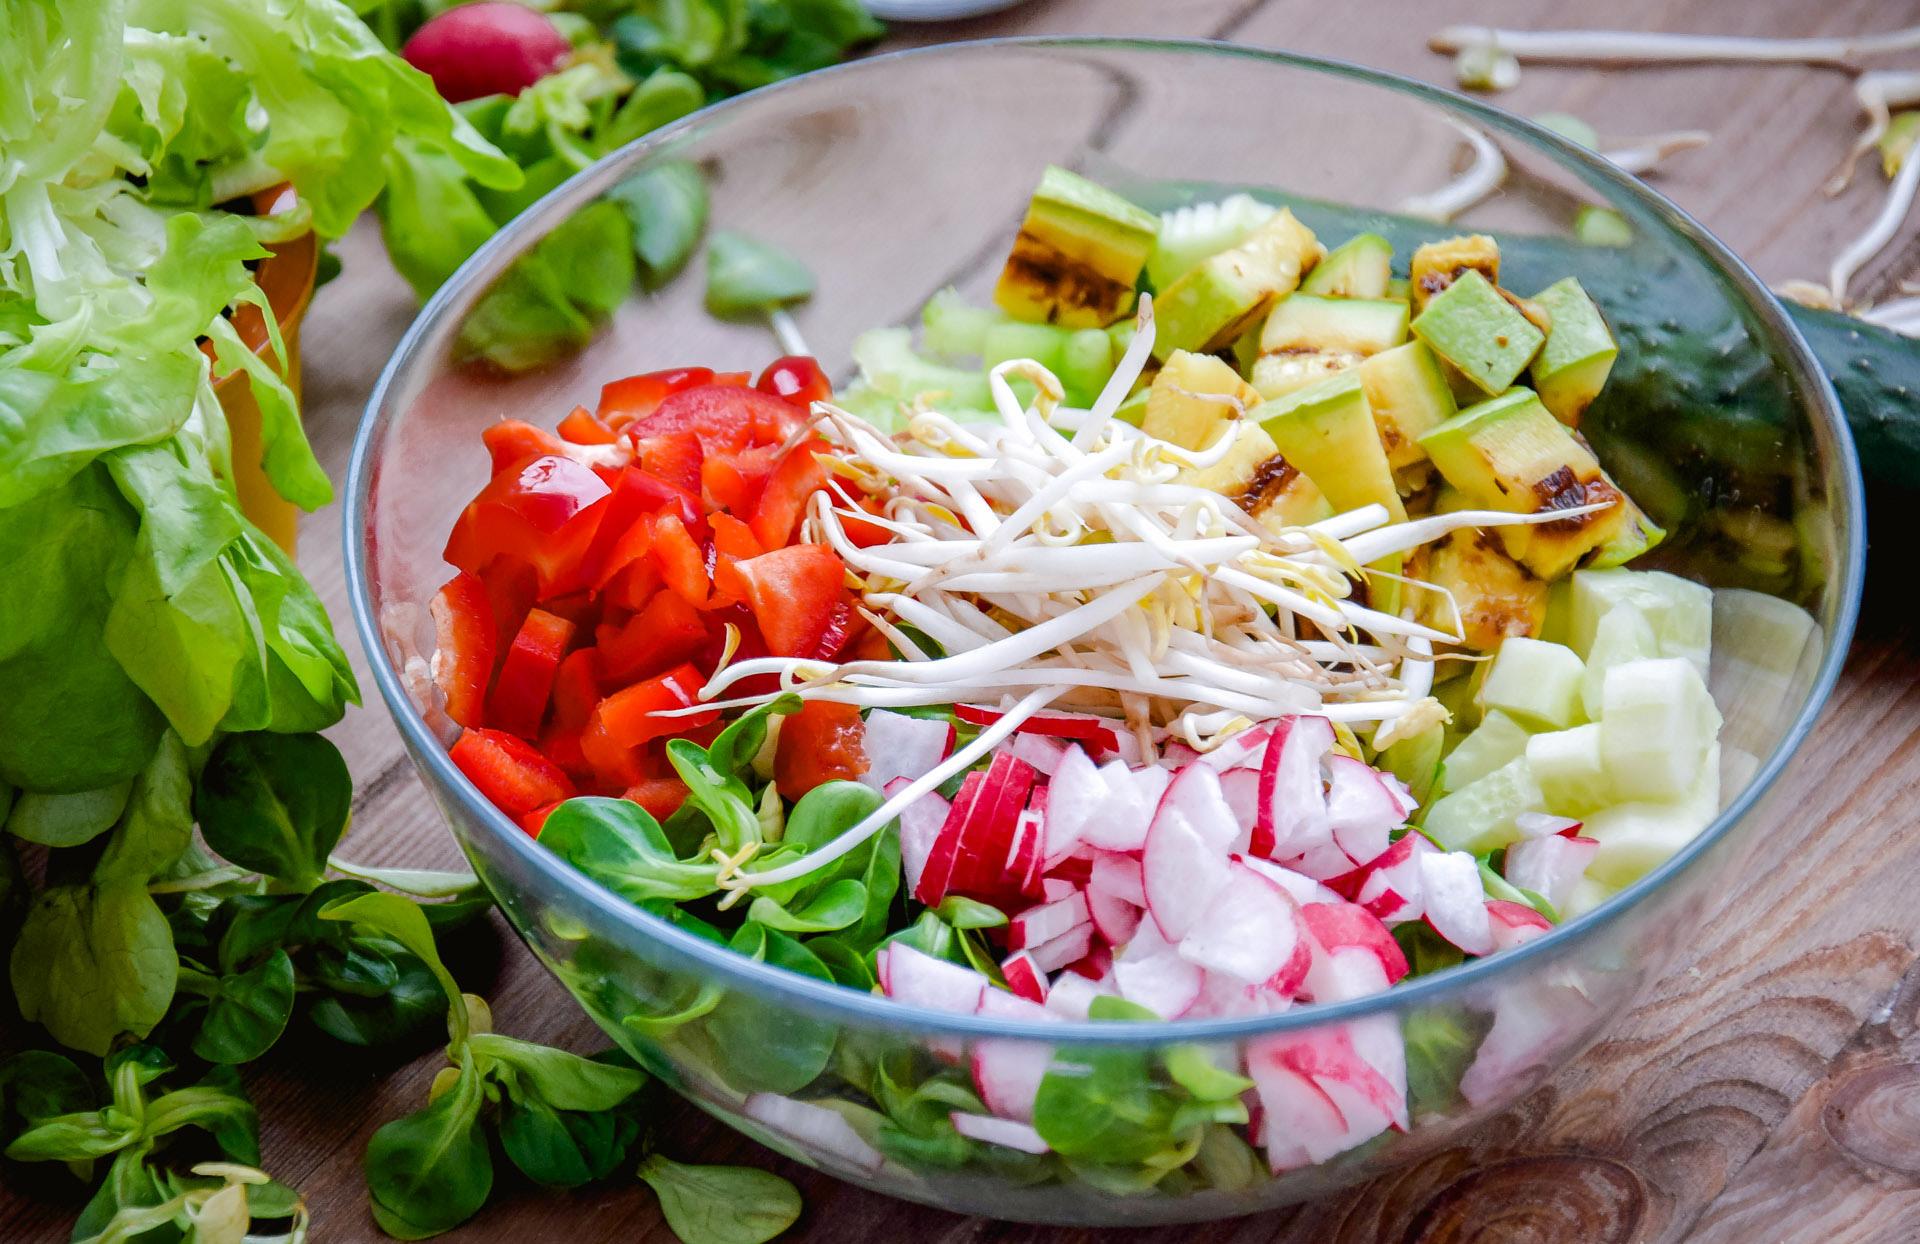 Салат в круглой салатнице